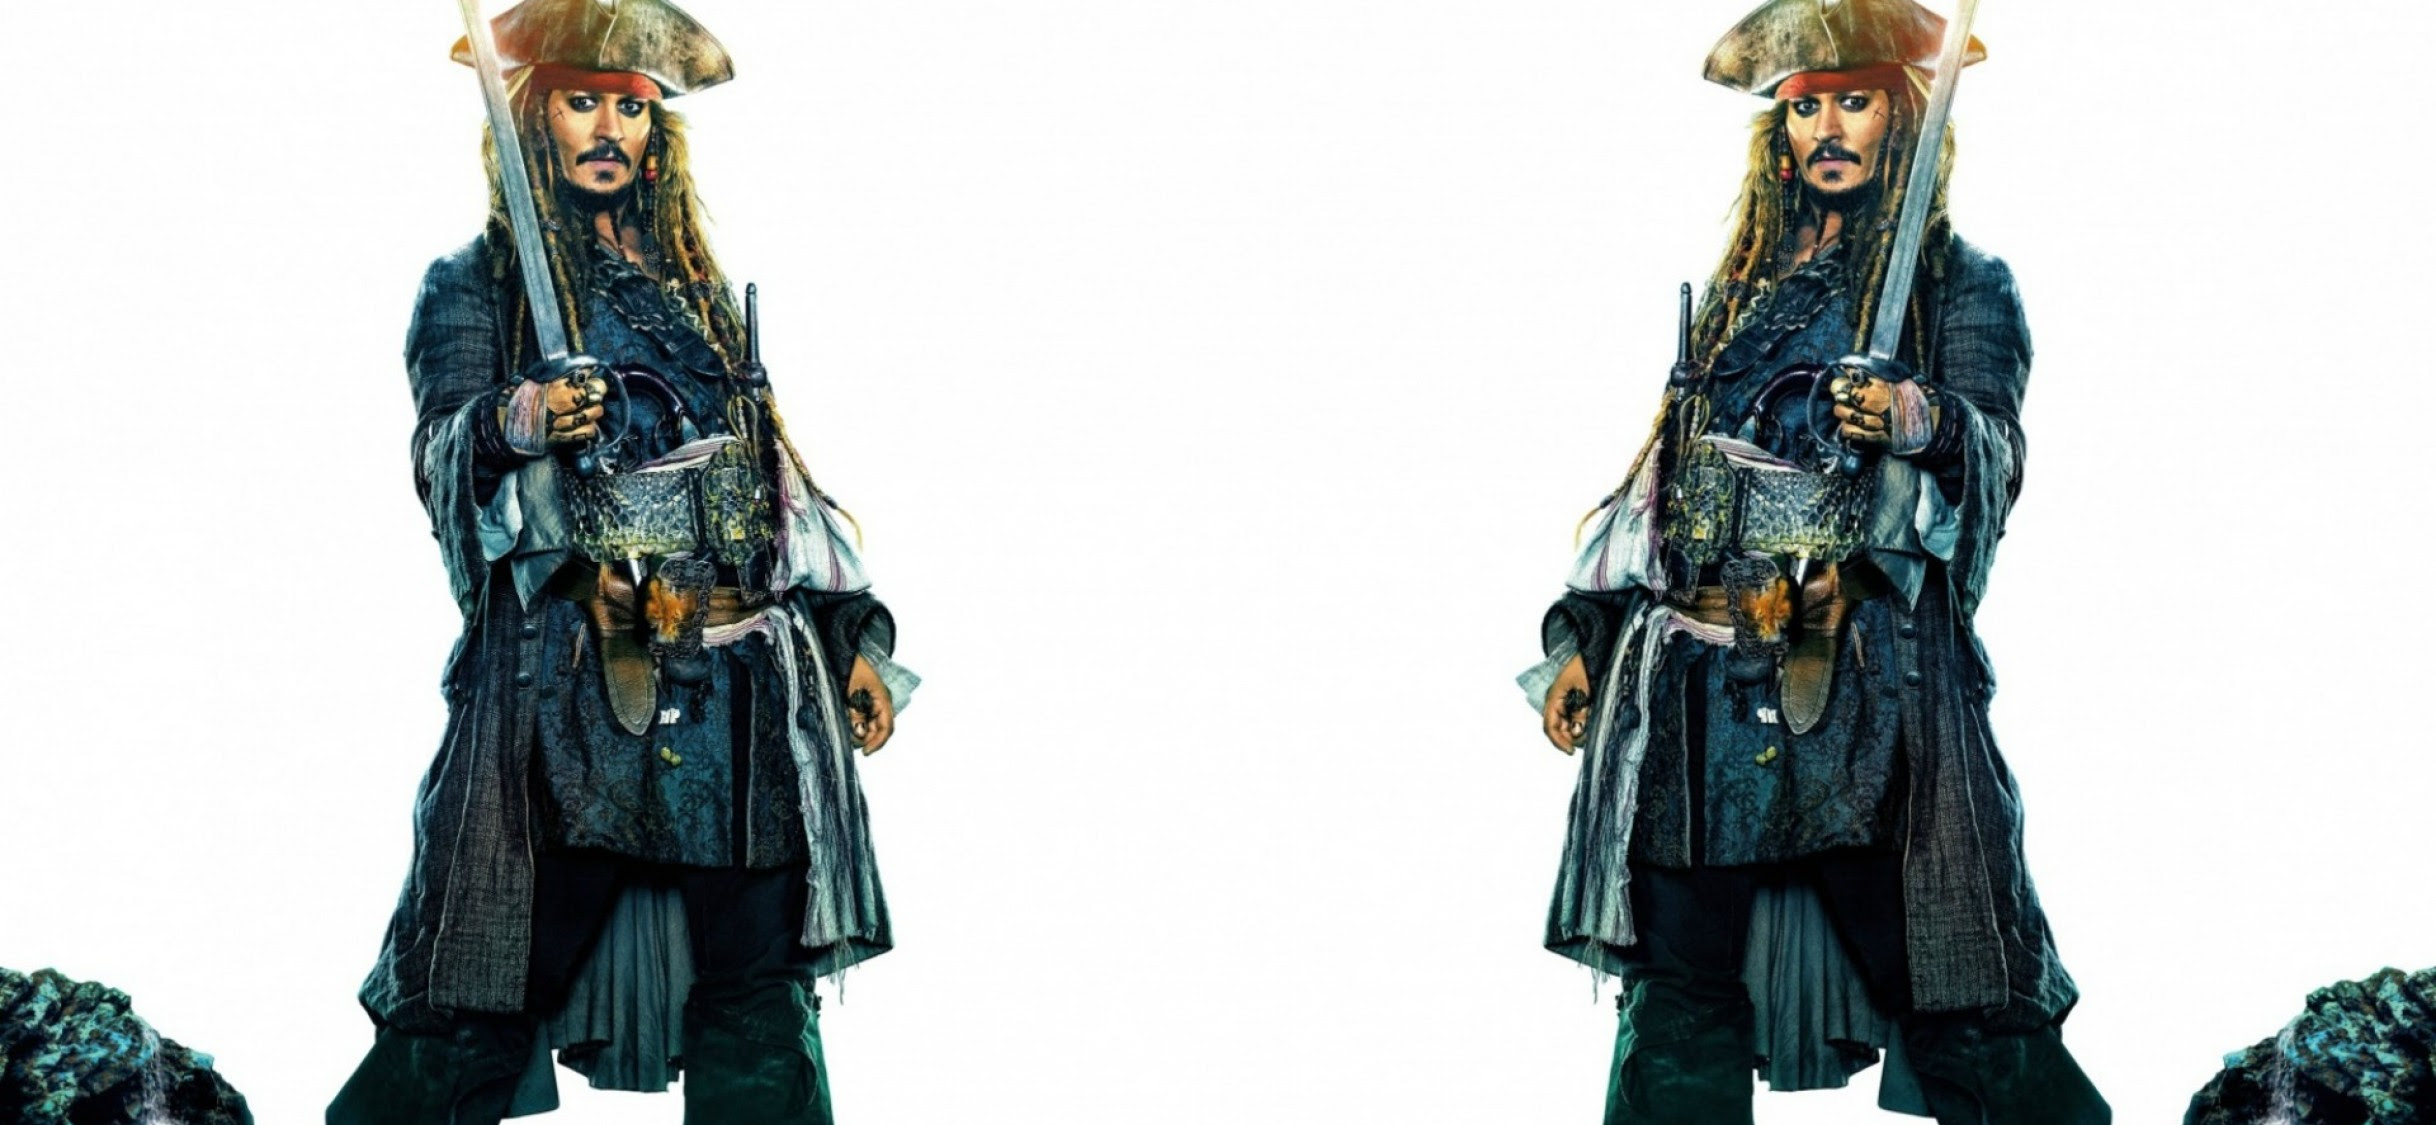 Pirates Of The Caribbean Hd Wallpaper Iphone X Hd Wallpaper